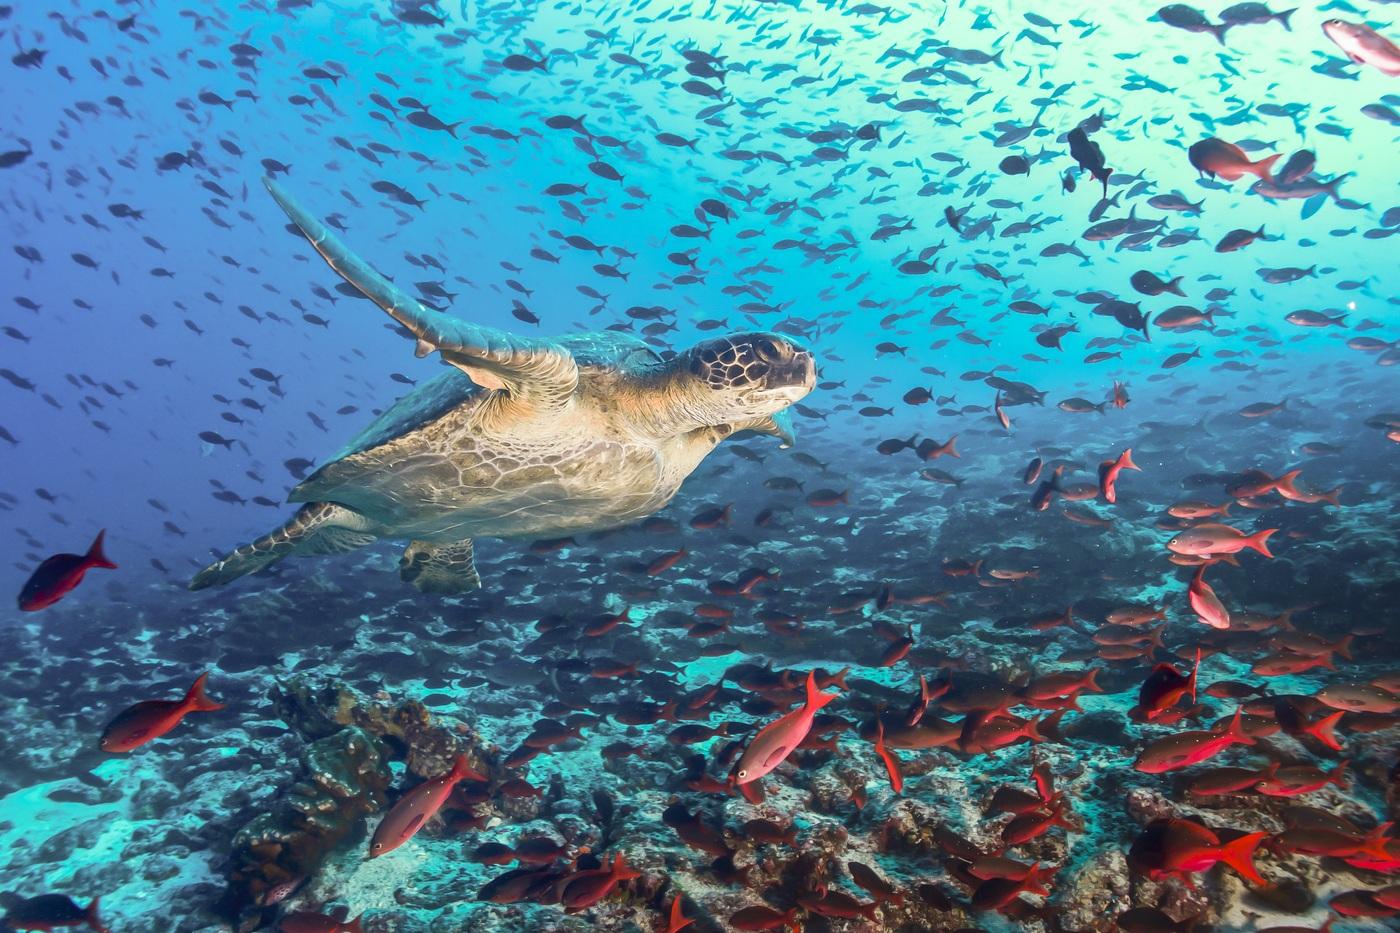 The Galapagos Islands